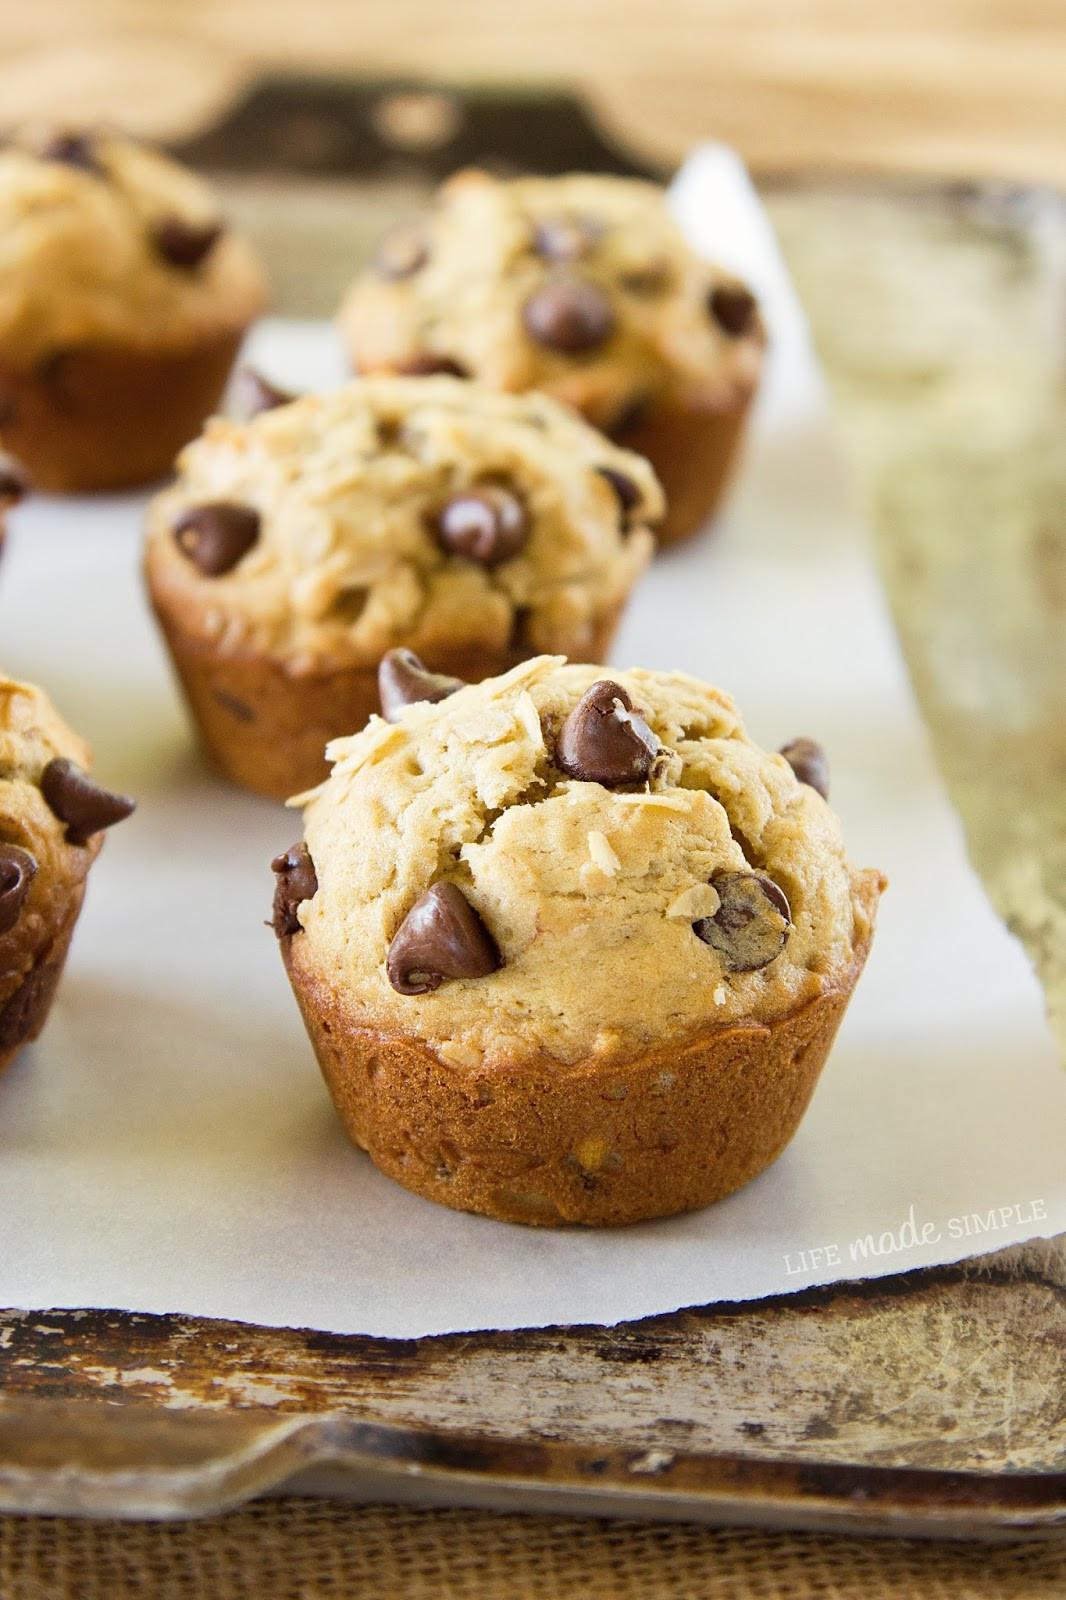 Banana Chocolate Chip Muffins Healthy  Oatmeal Chocolate Chip Banana Muffins Life Made Simple